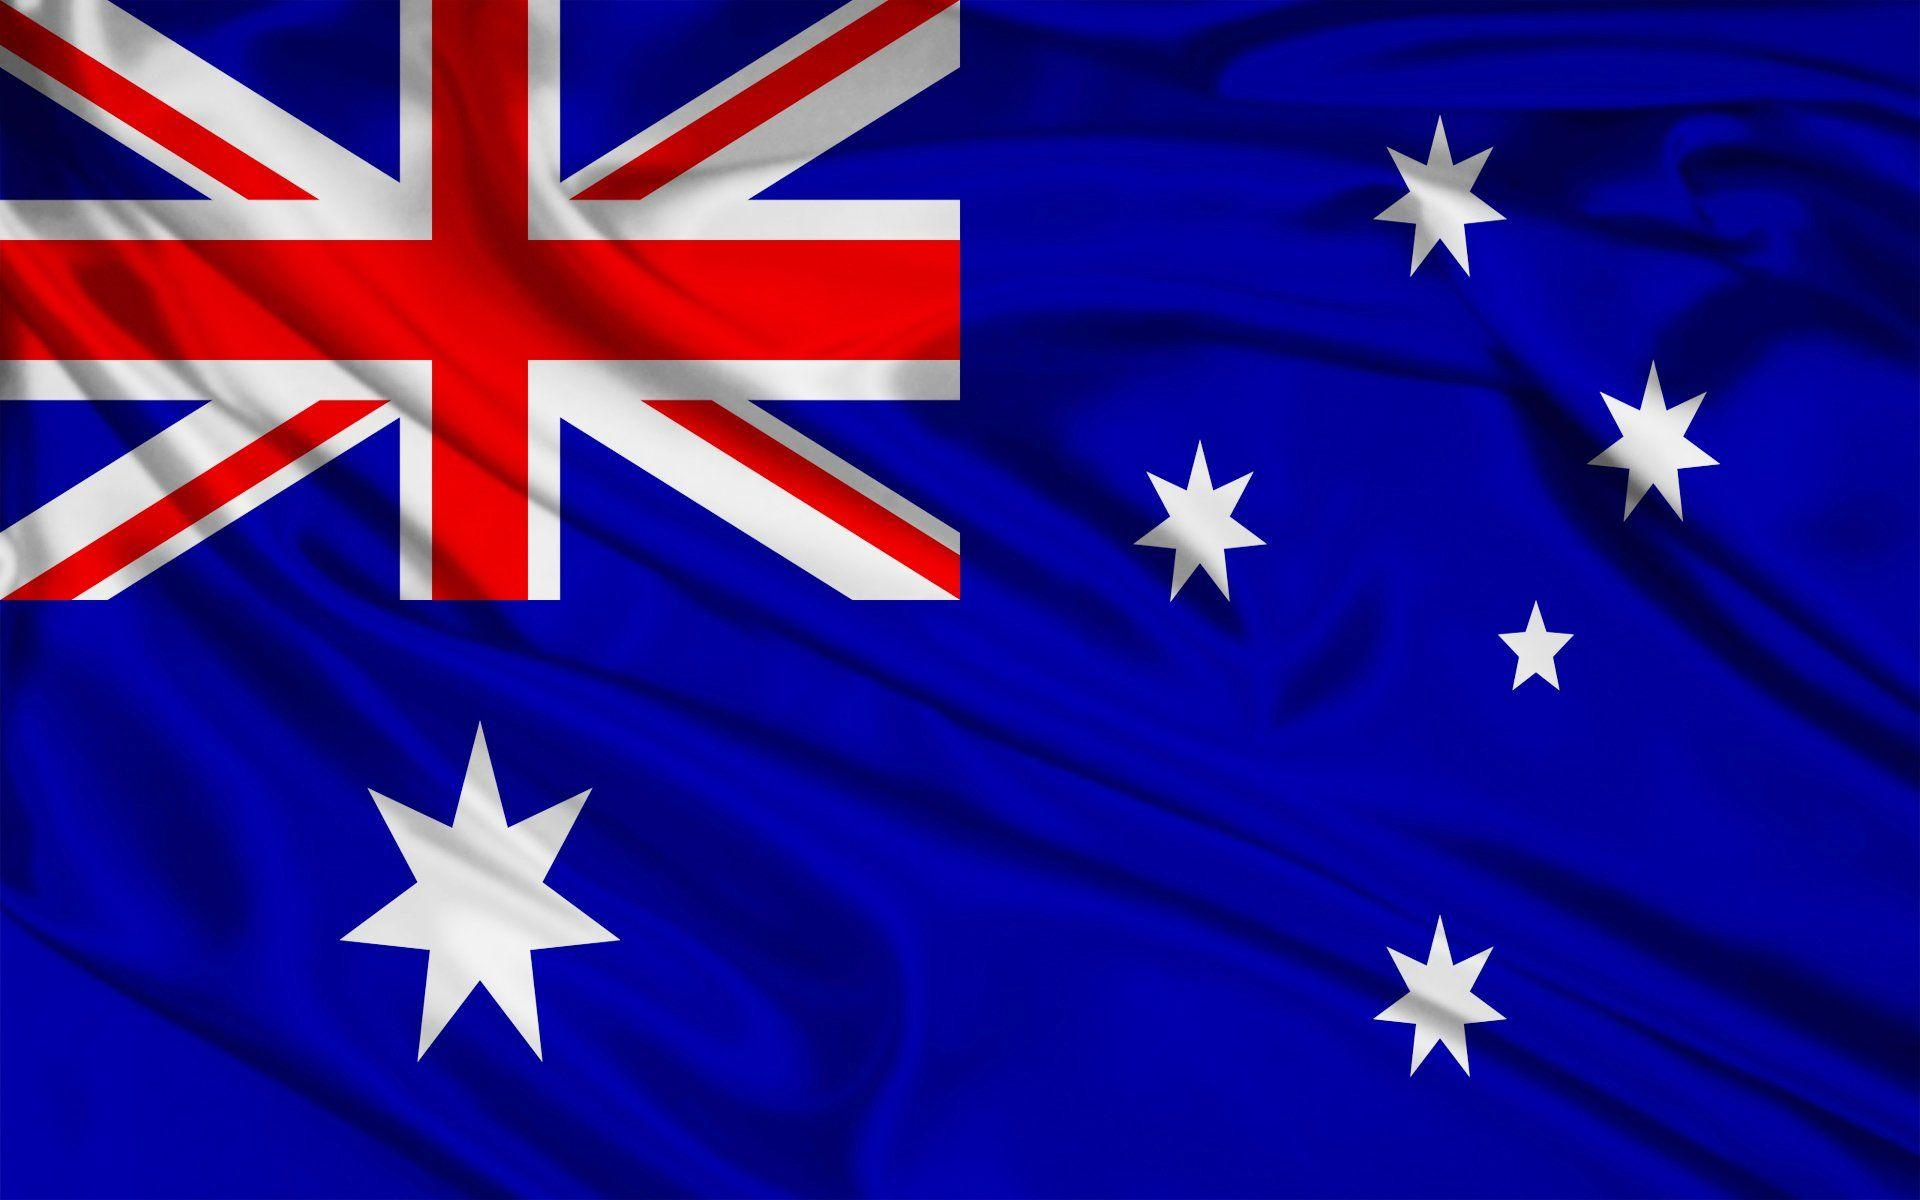 Australia Flag Wallpapers - Wallpaper Cave